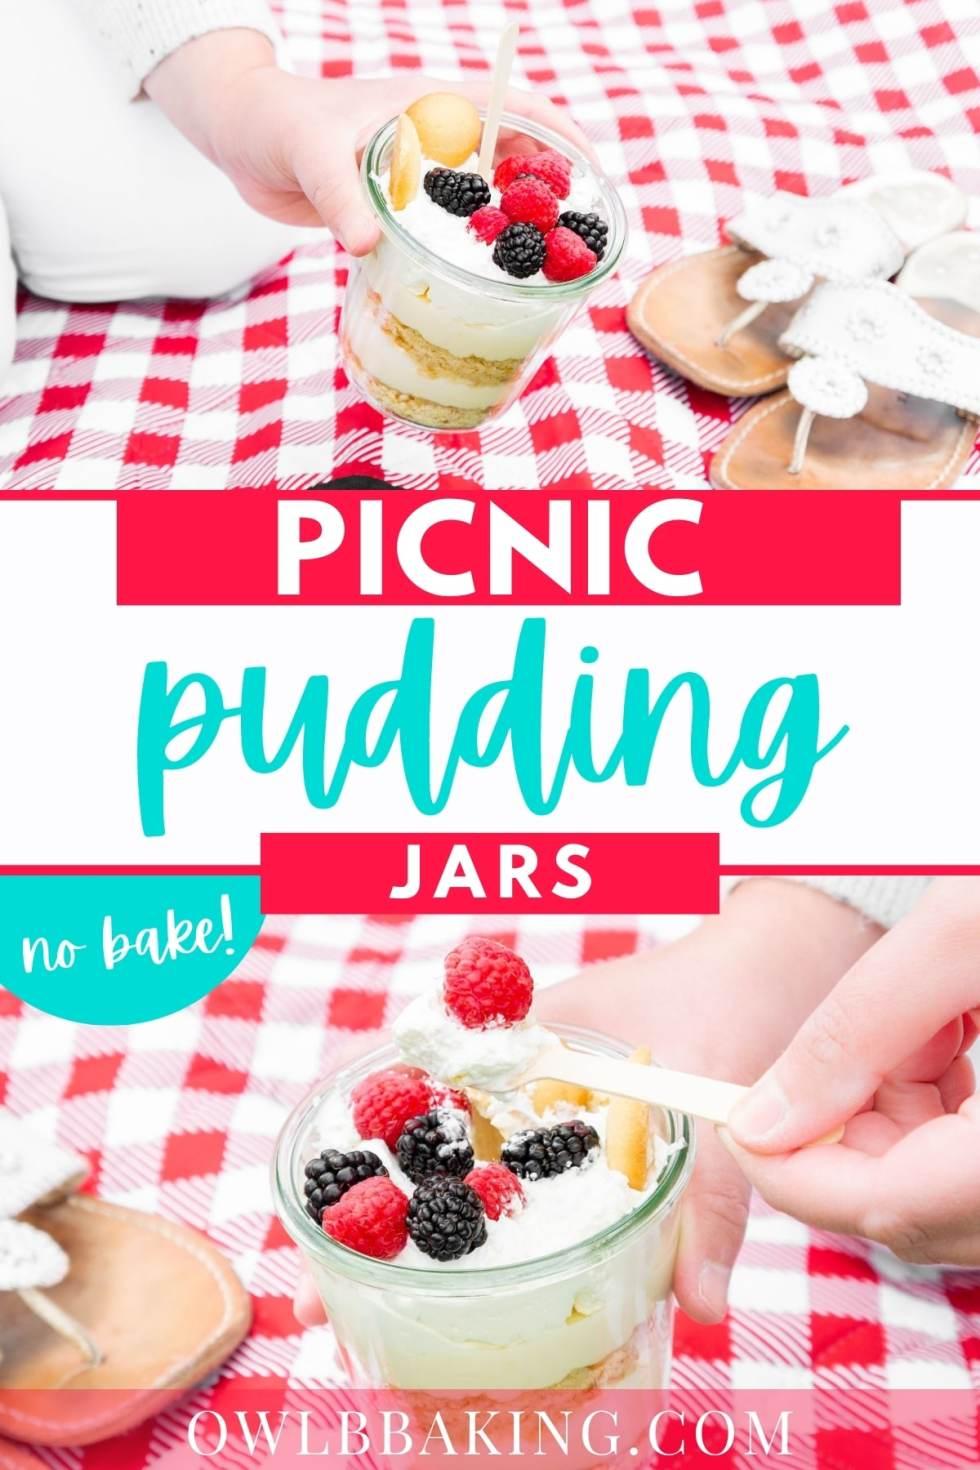 Picnic Pudding Jars